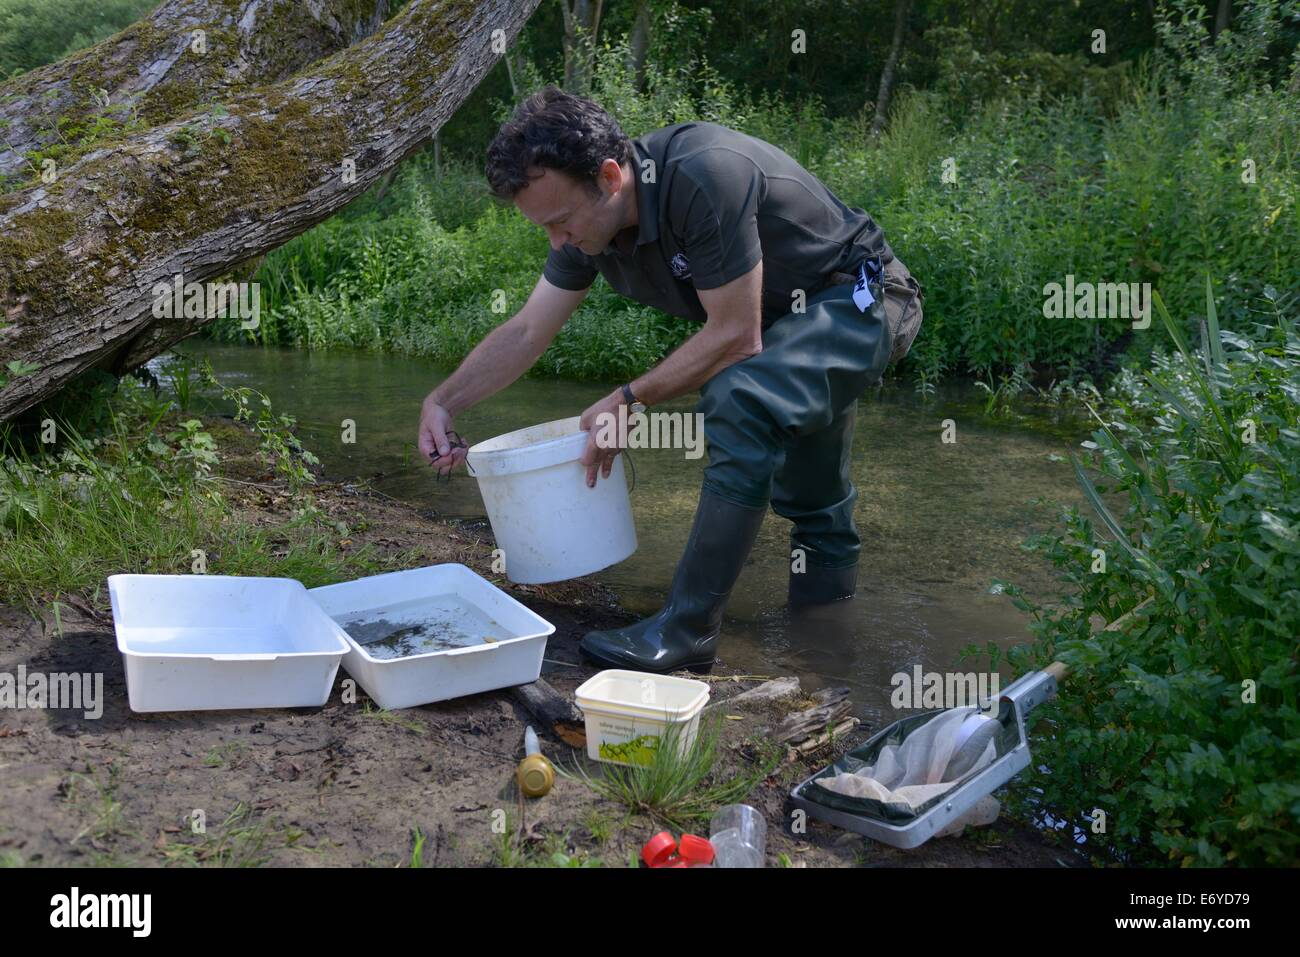 Gloucestershire Wildllife Vertrauen Arbeiter Wirbellosen Probenahme Forschung in den Fluss Windrush nahe Bourton Stockbild